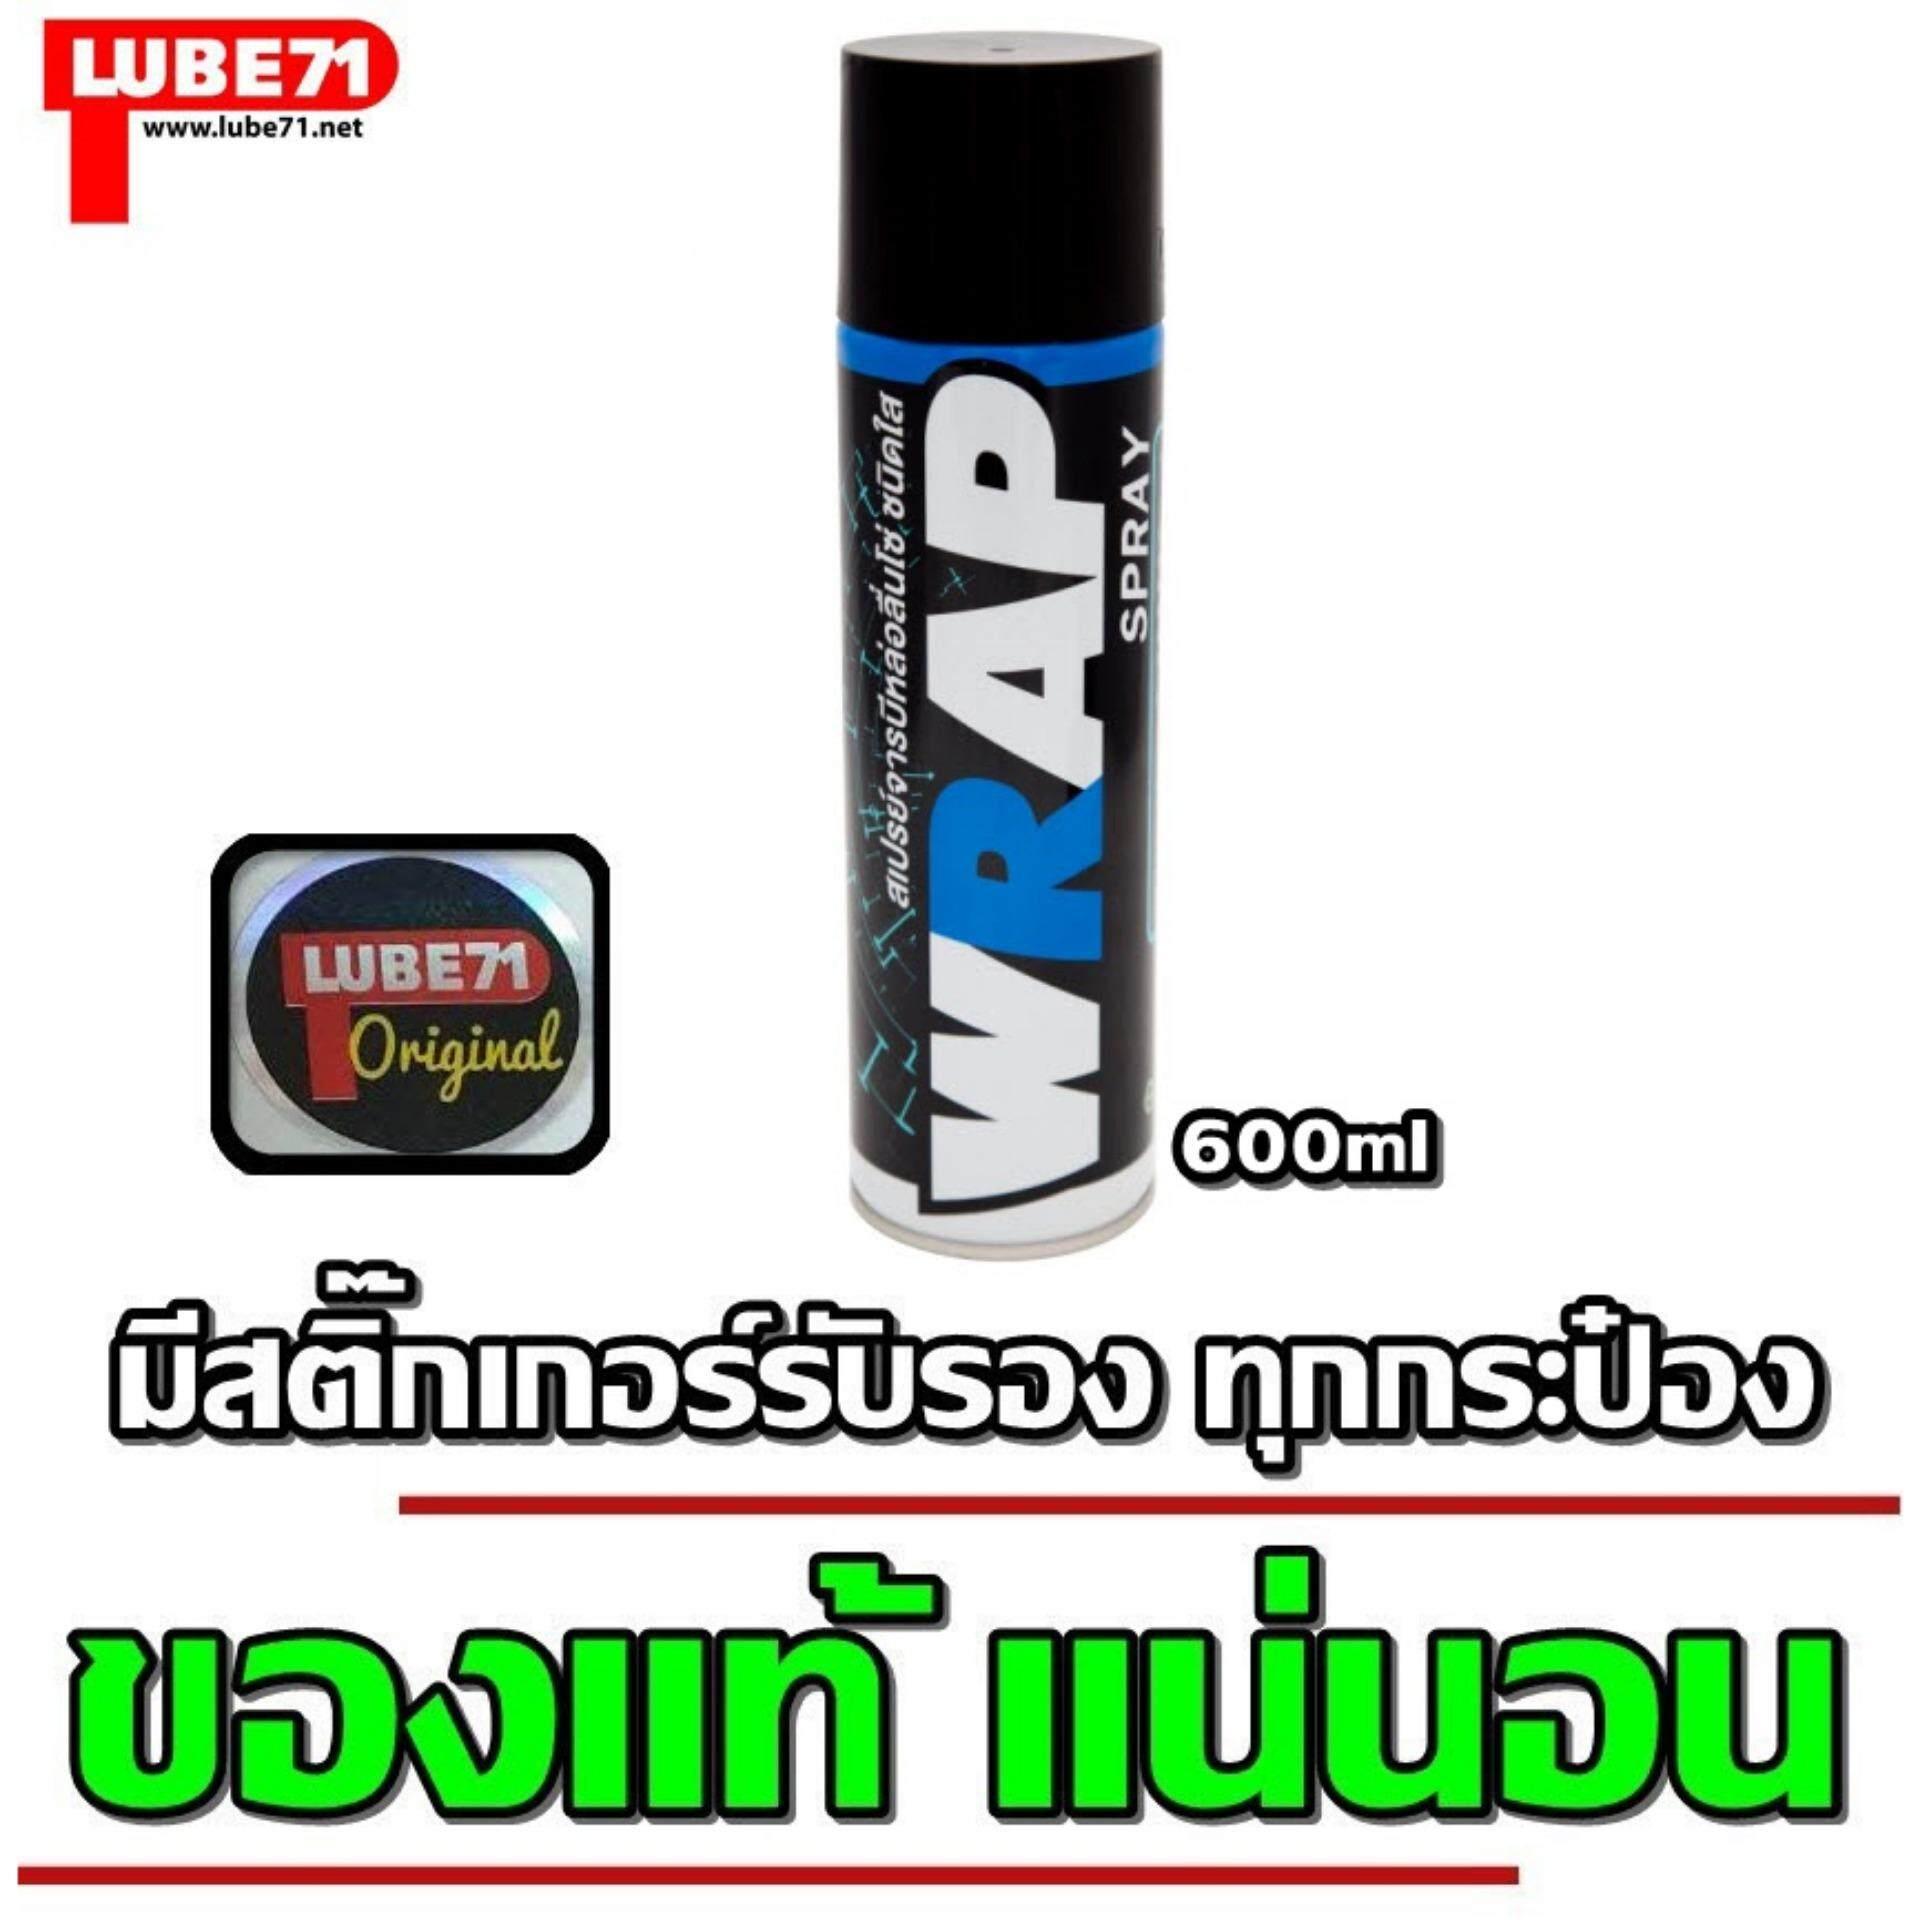 Lube71 Wrap Spray Motorcycle 600ml (clear-Color) สเปรย์หล่อลื่นโซ่มอเตอร์ไซค์ สีใส By Lube71shop.